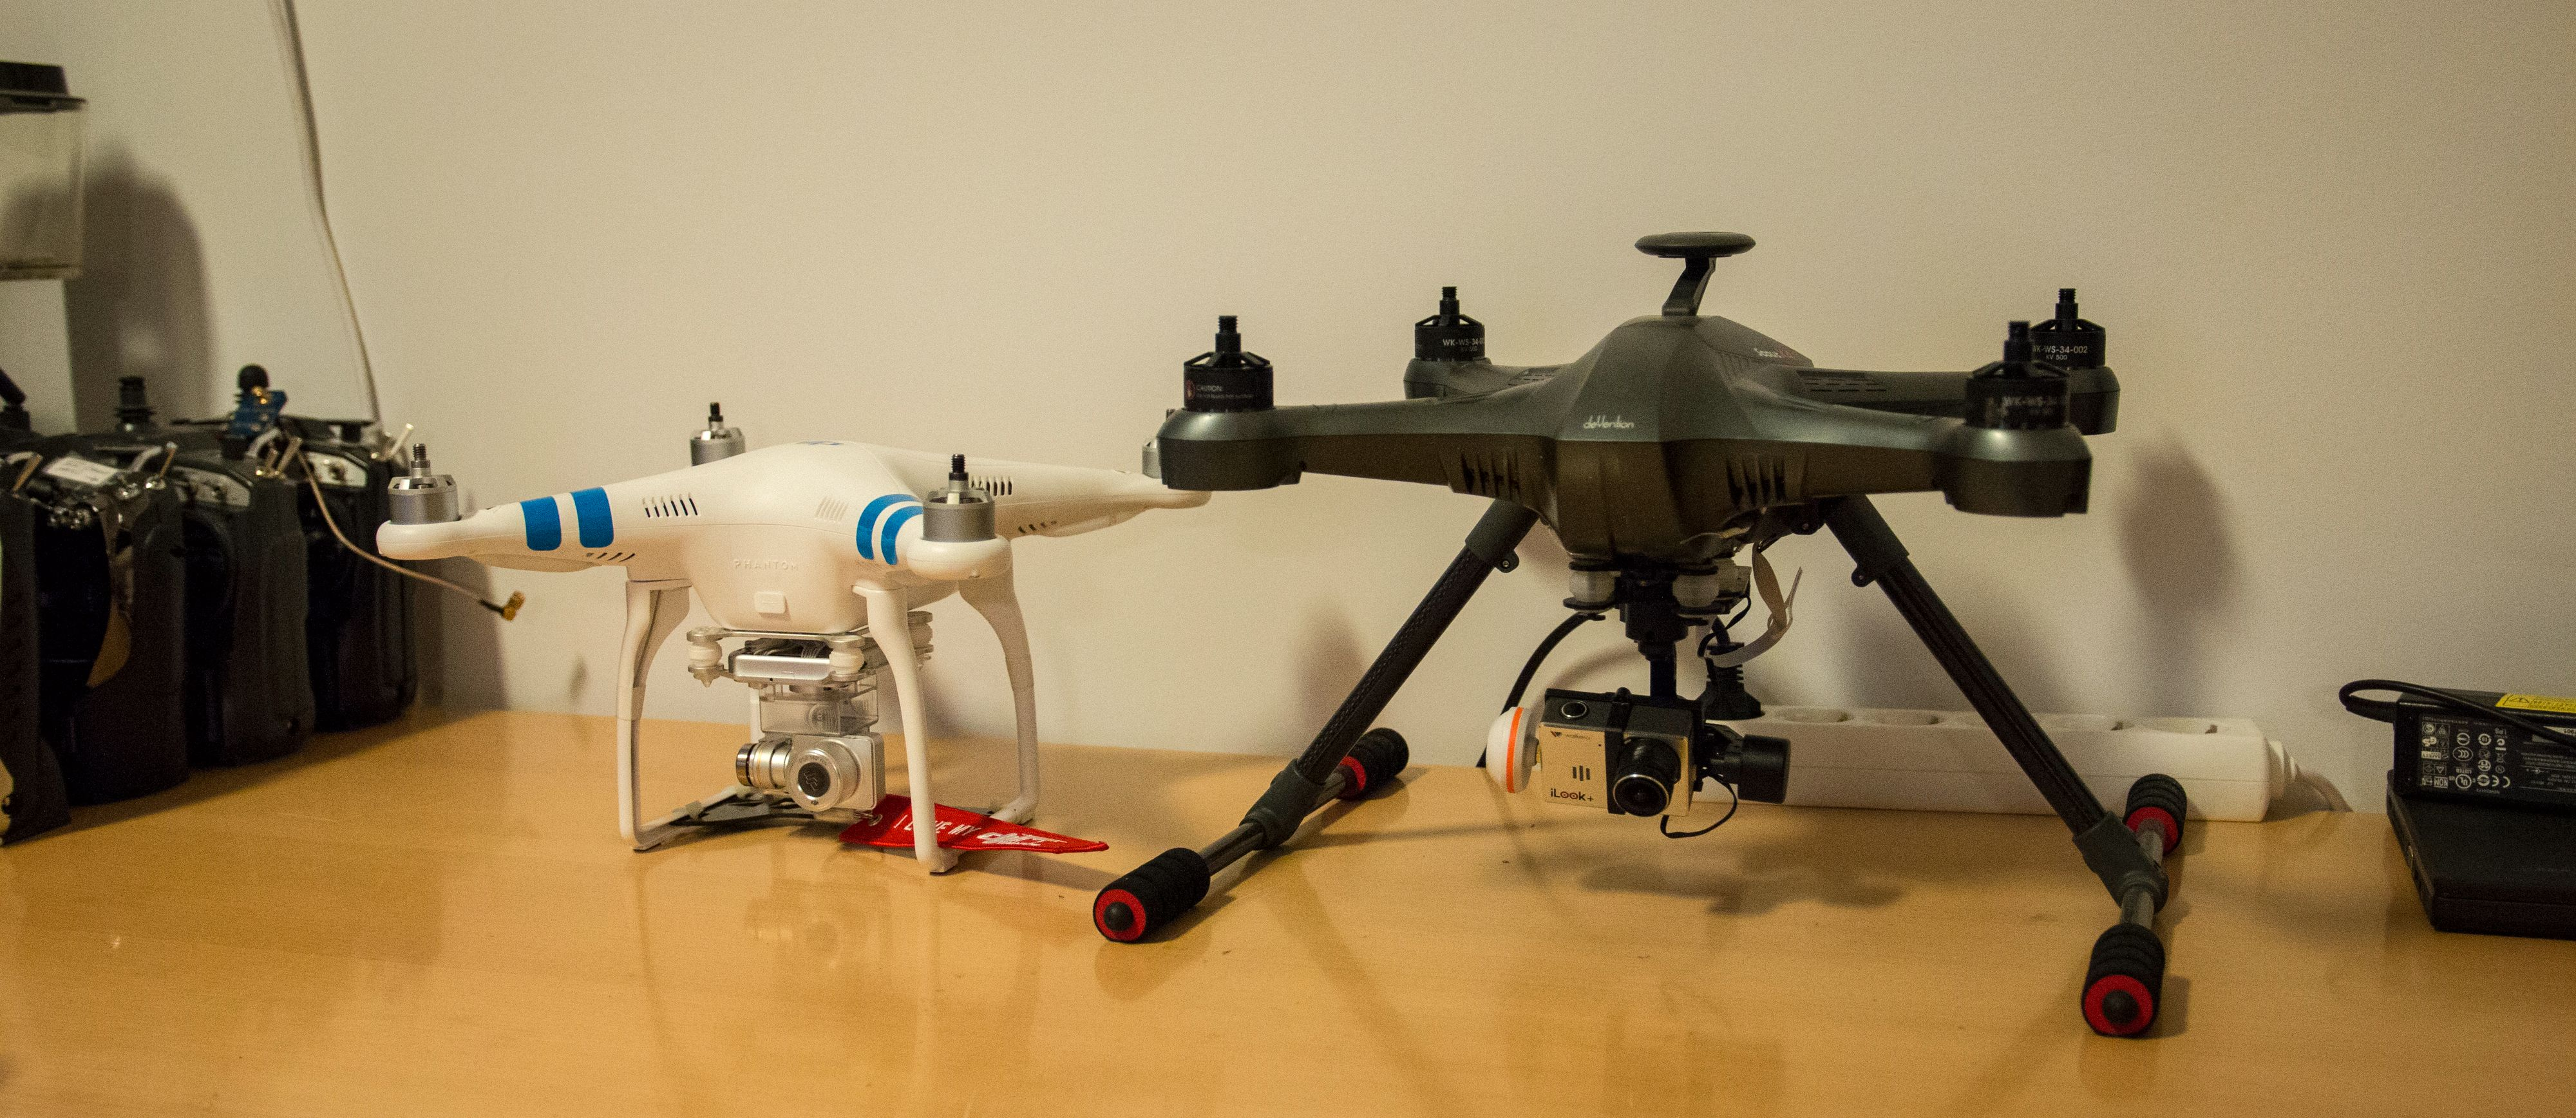 Noen mindre kameradroner under arbeid. Foto: Kristoffer Møllevik